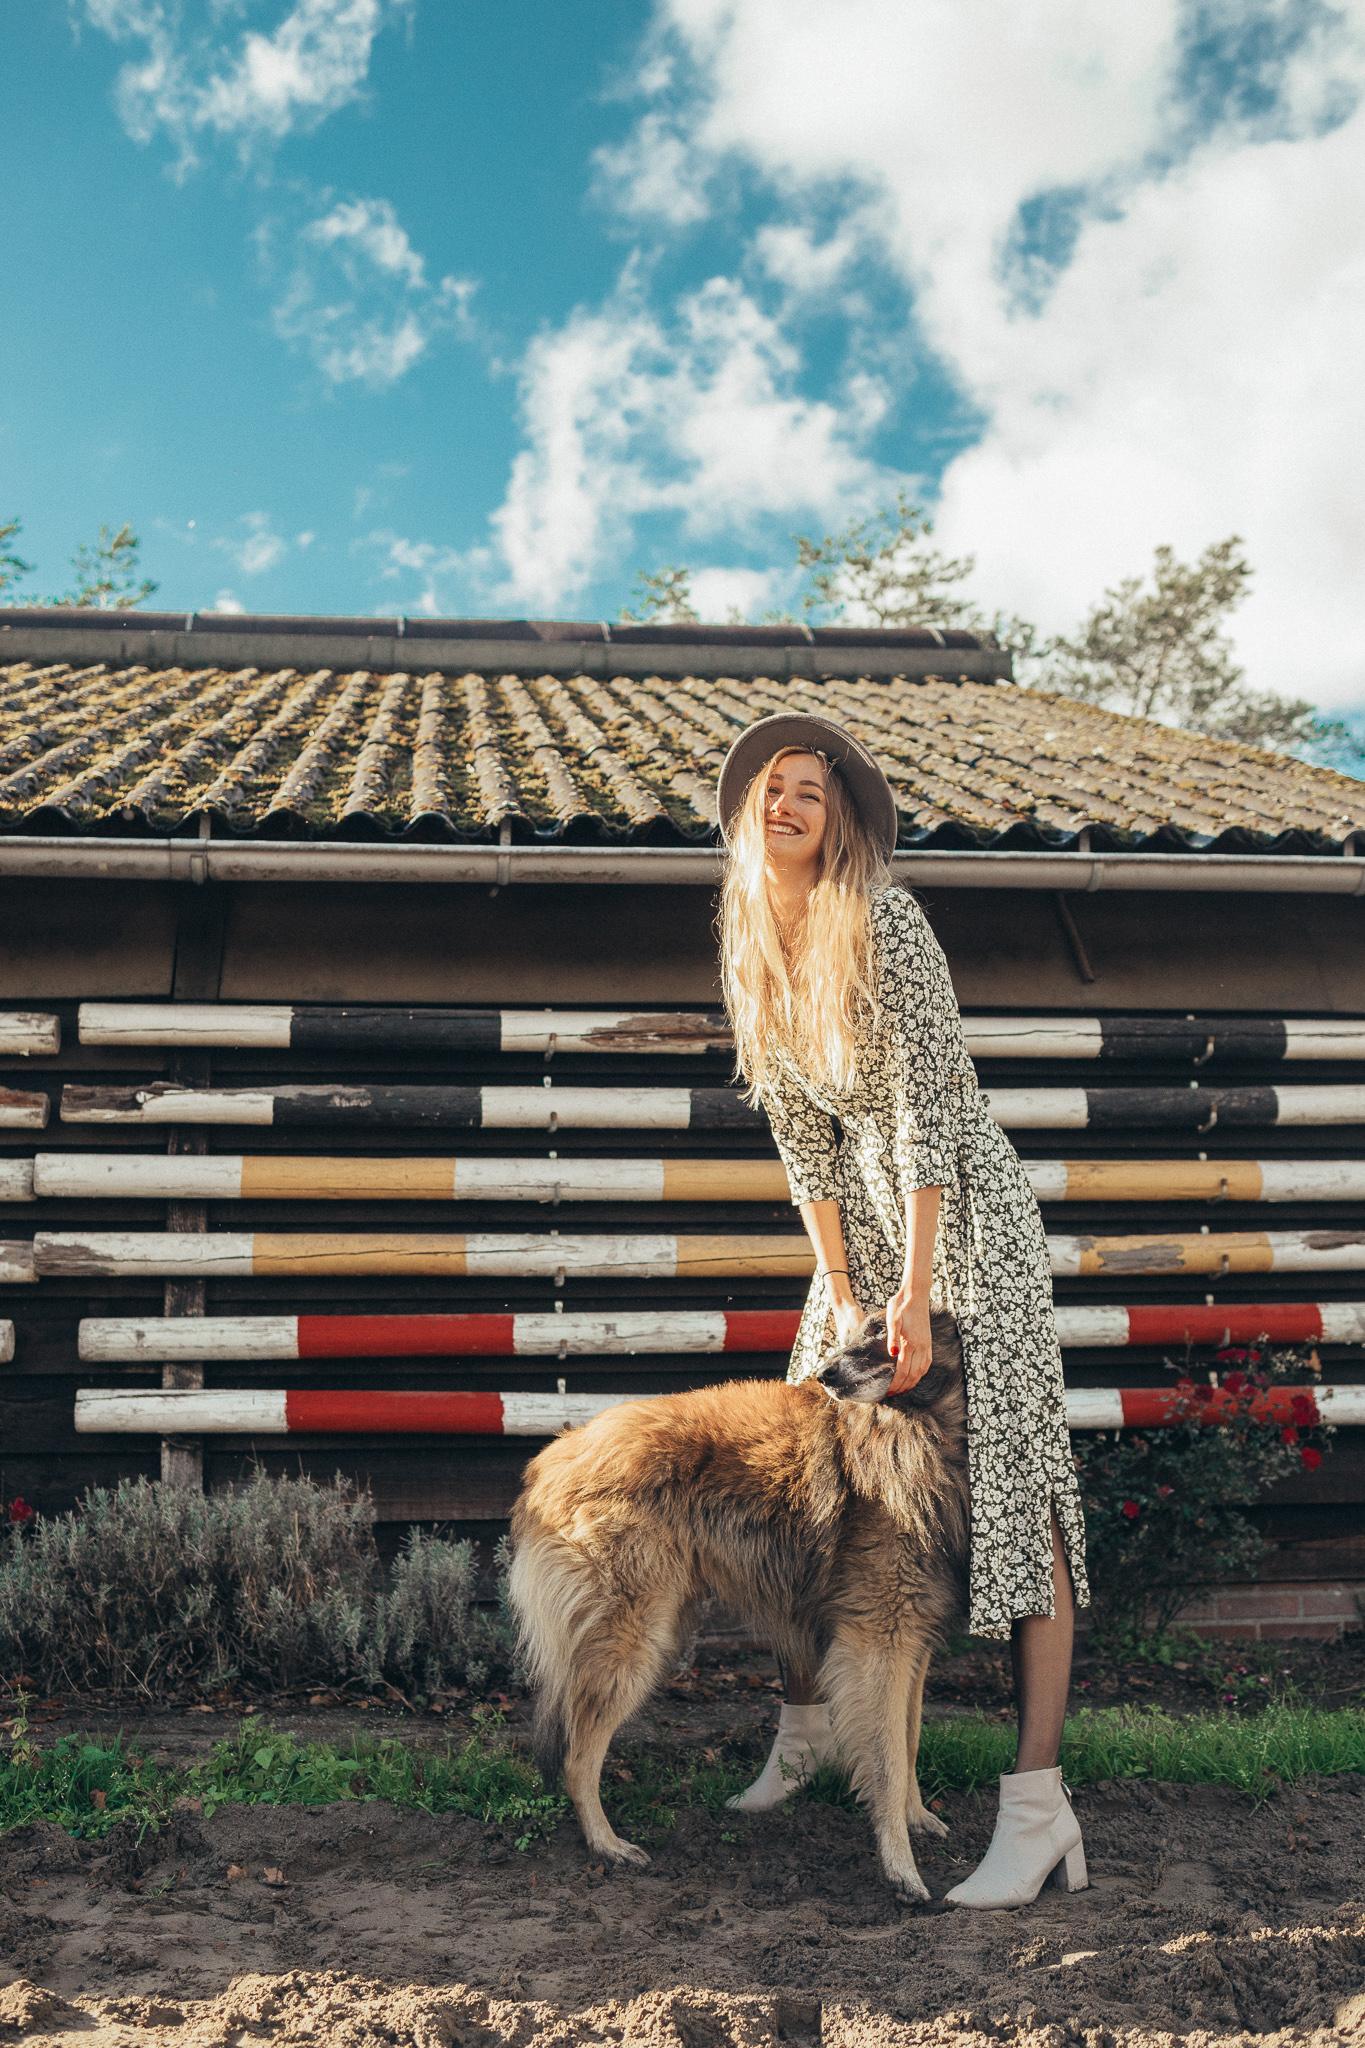 modebloggers uit nederland